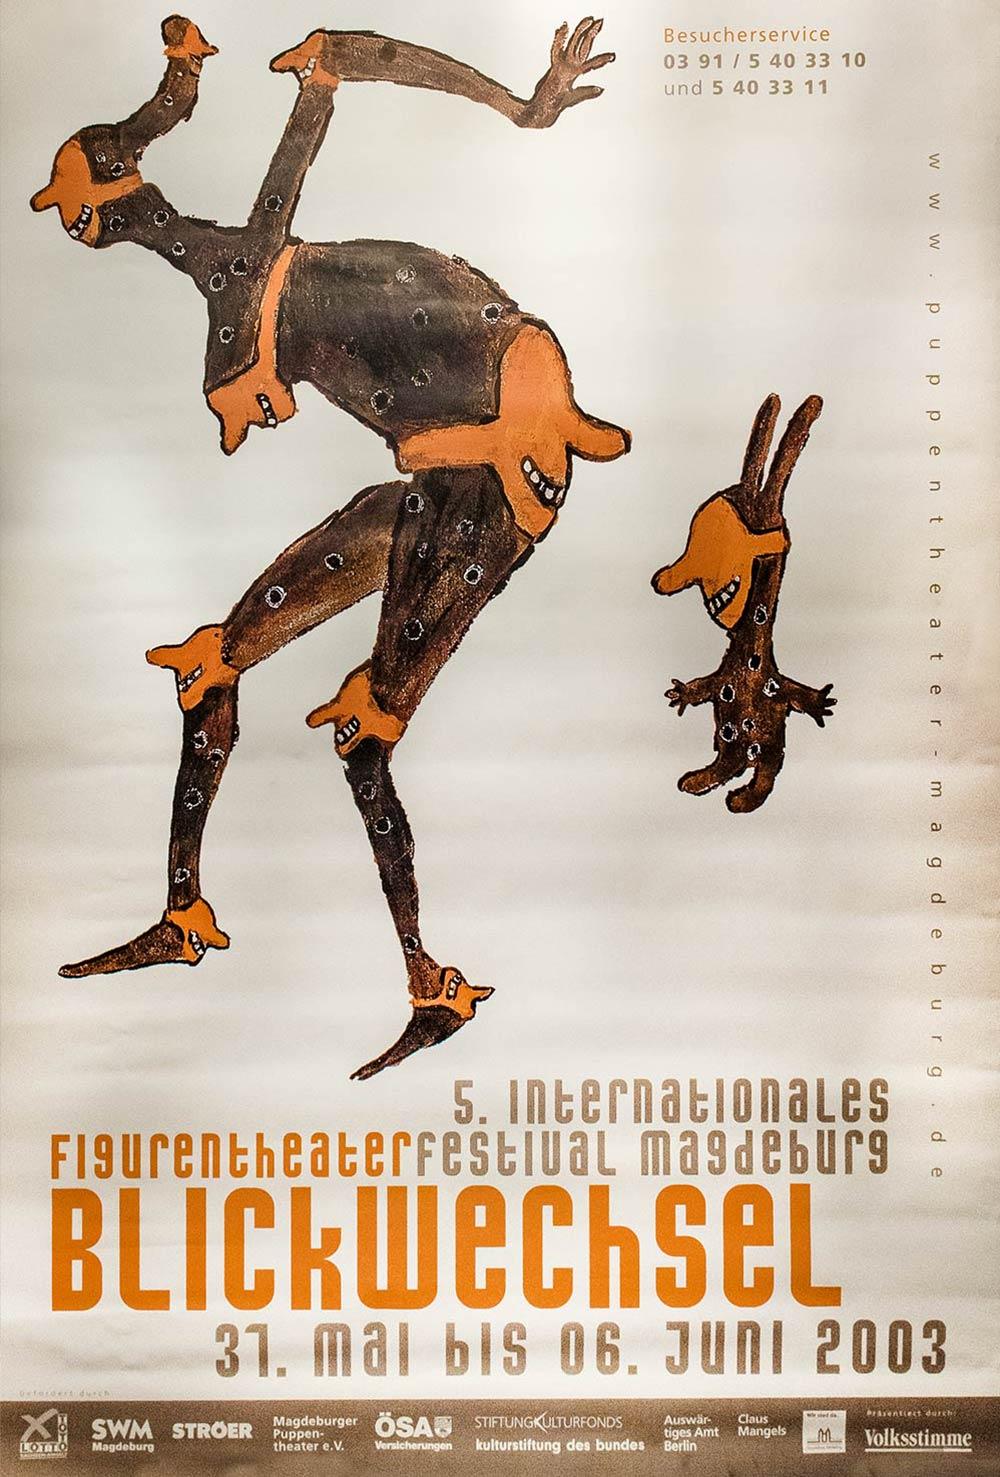 Blickwechselfestival 2003